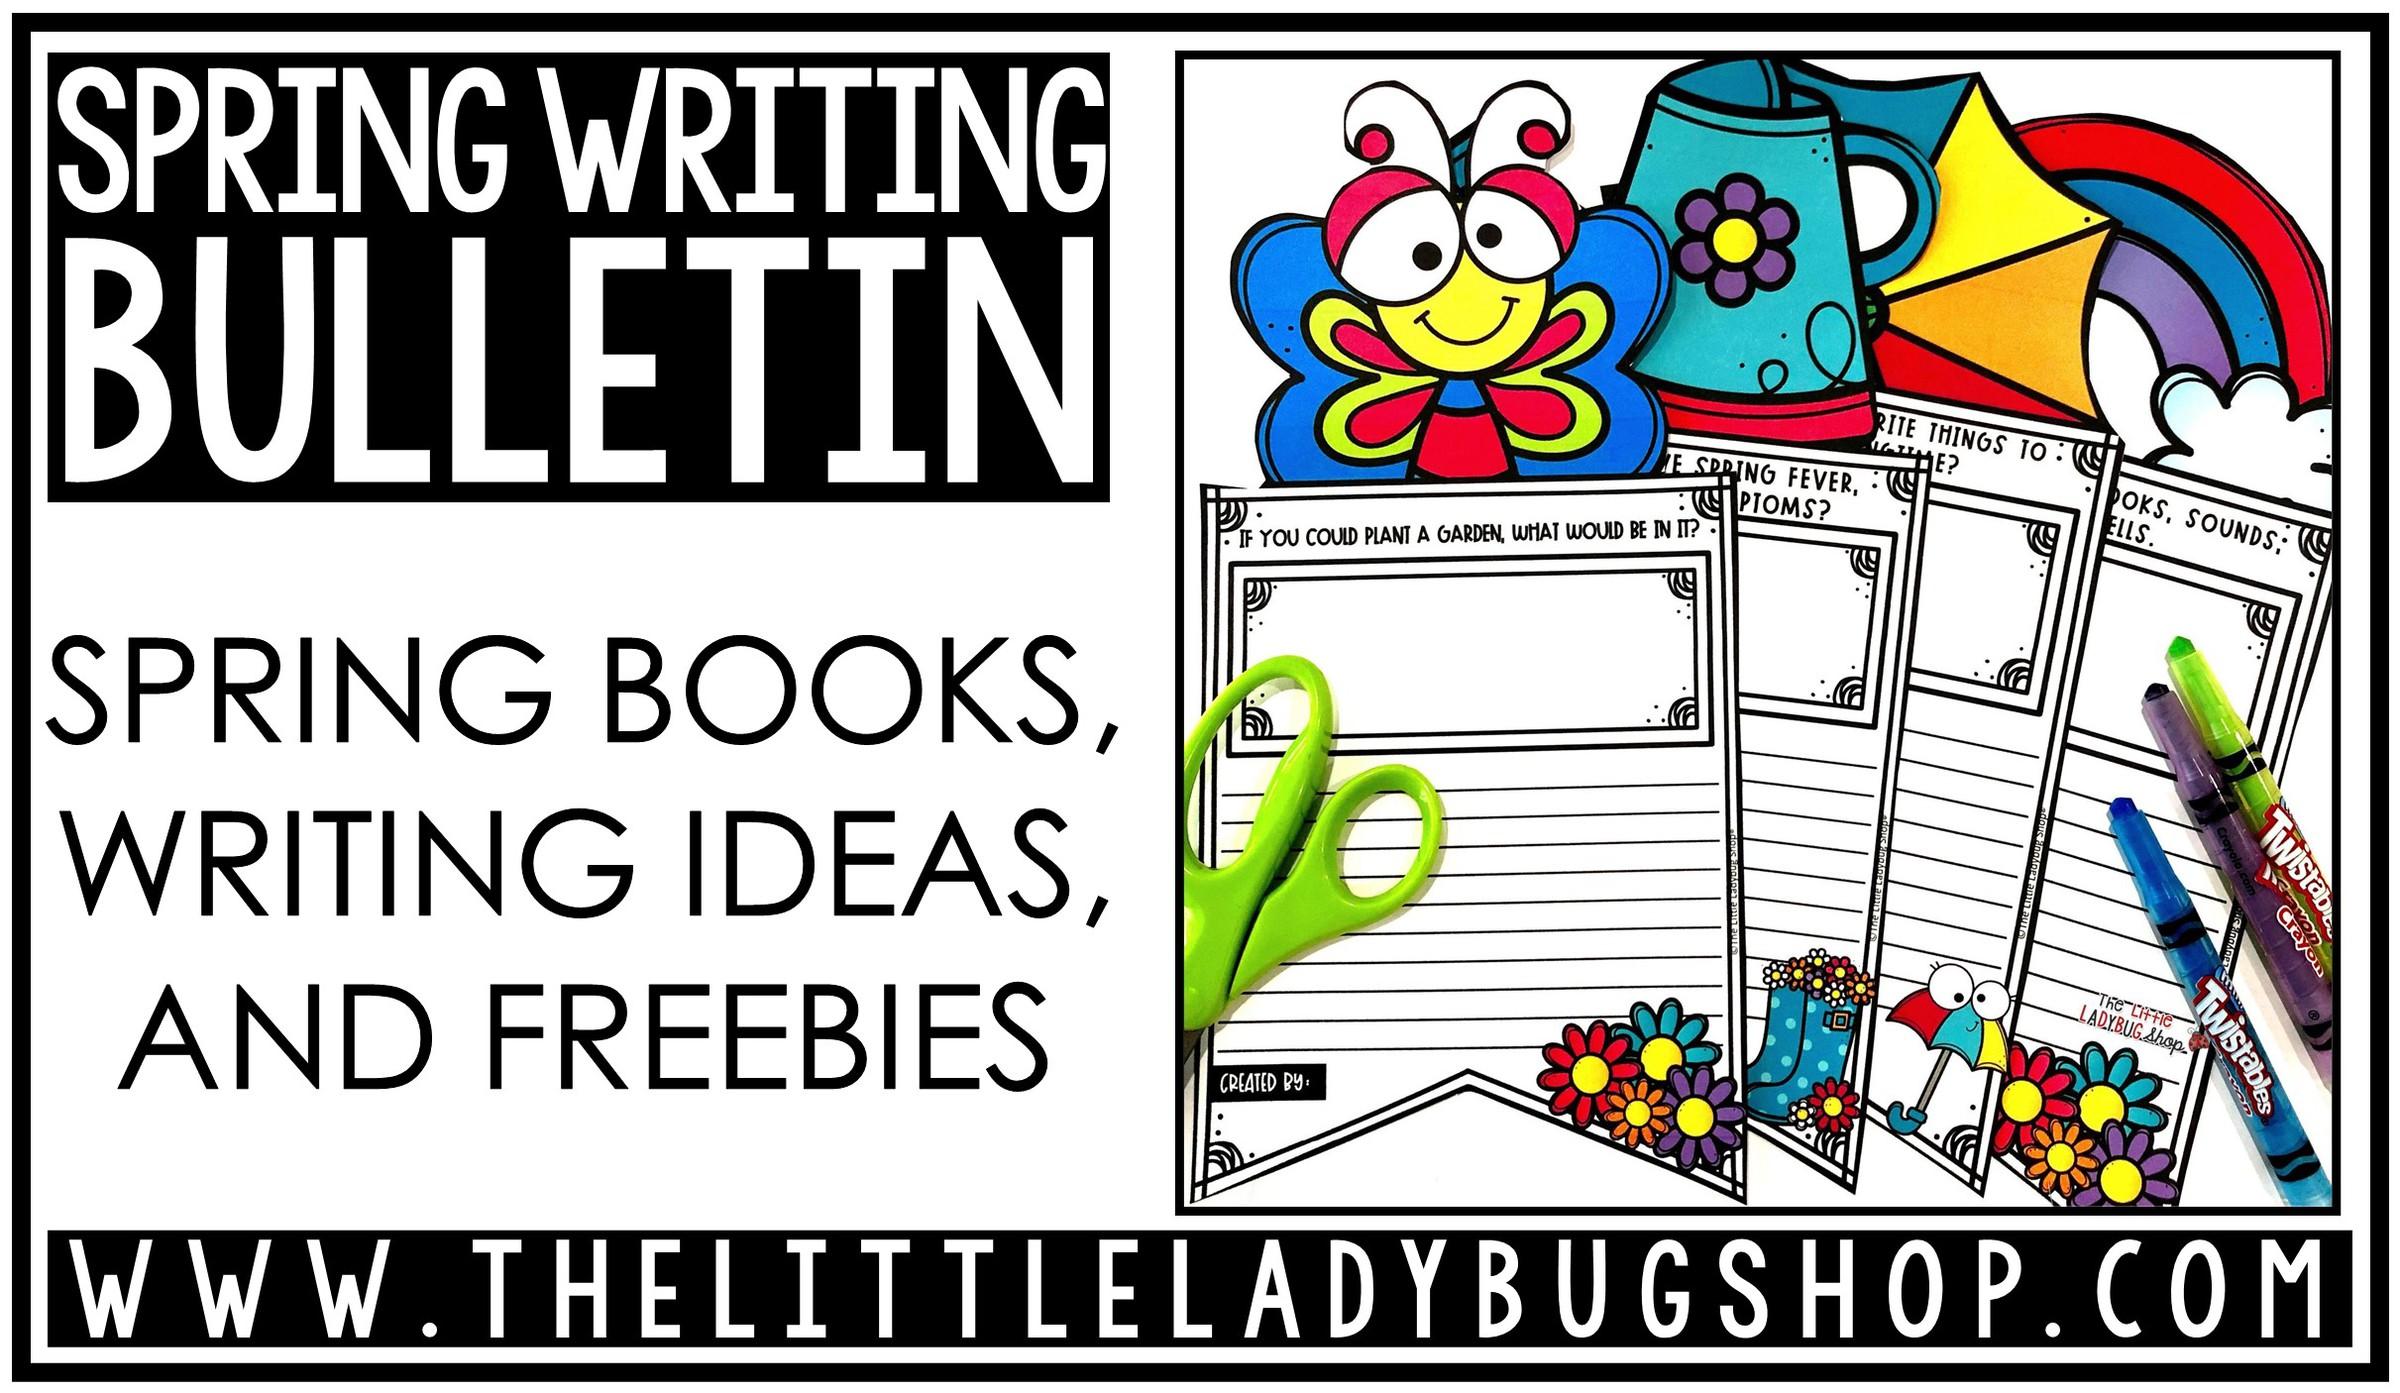 Spring Writing Bulletin Board Ideas The Little Ladybug Shop